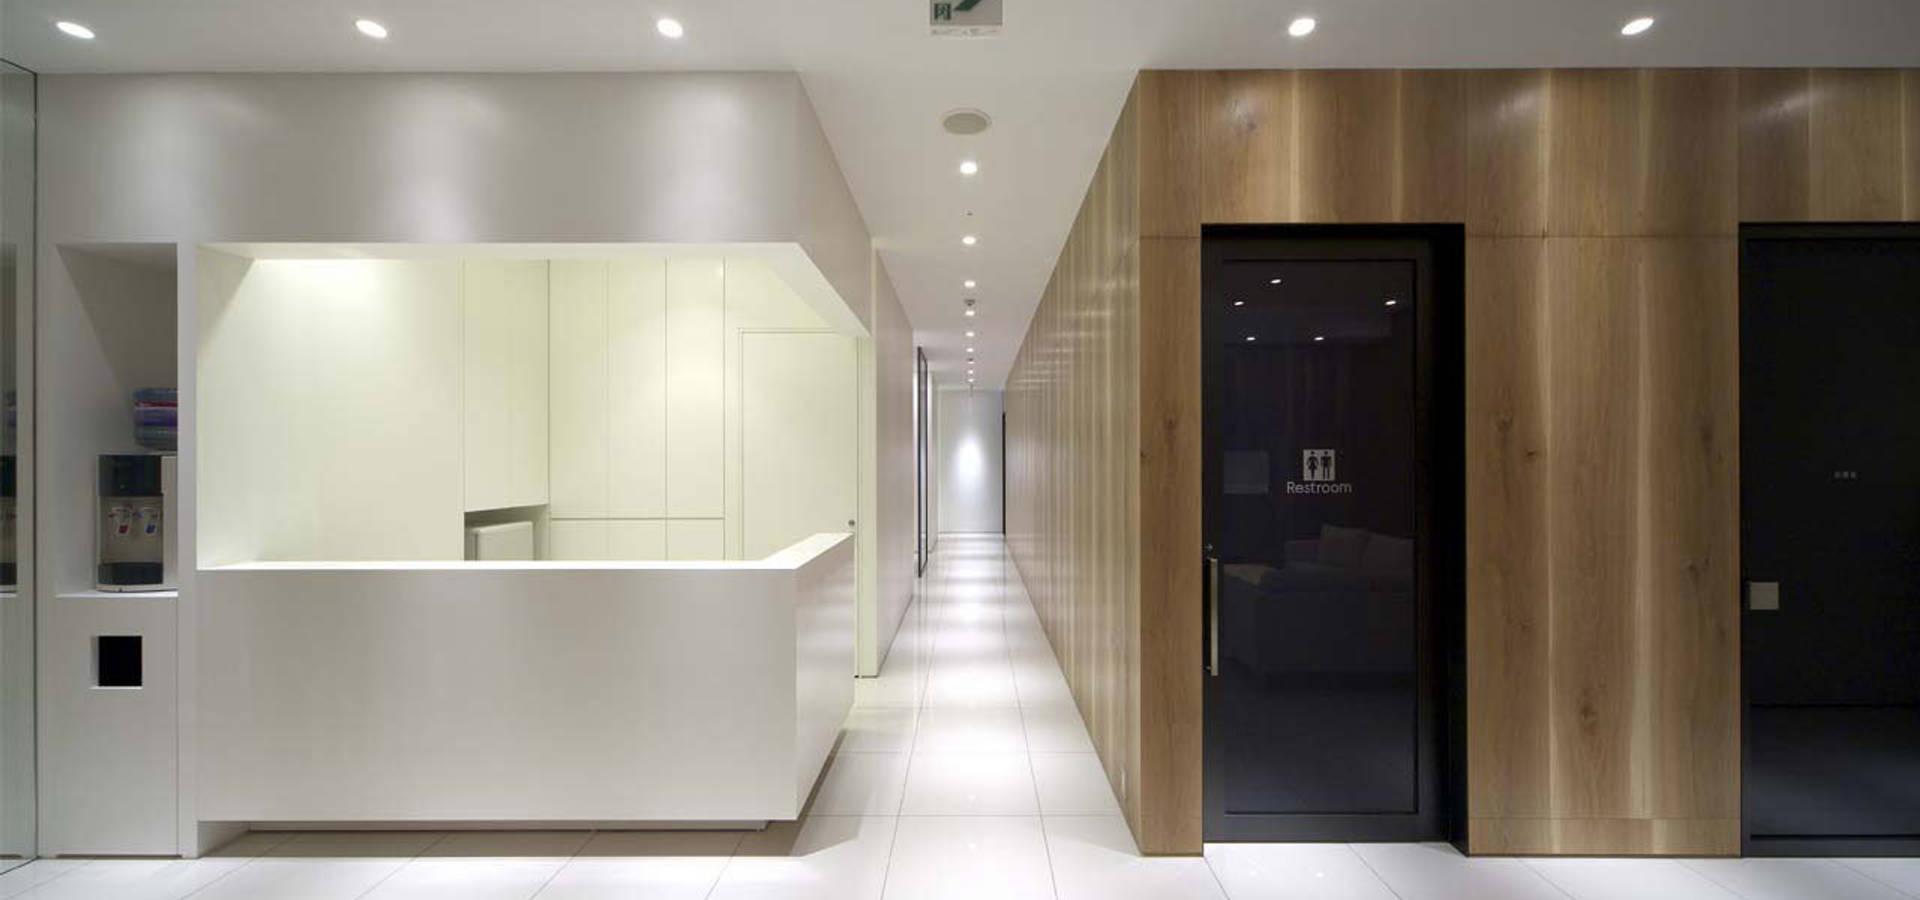 Cong Design Office, Co.,Ltd.( コングデザインオフィス)